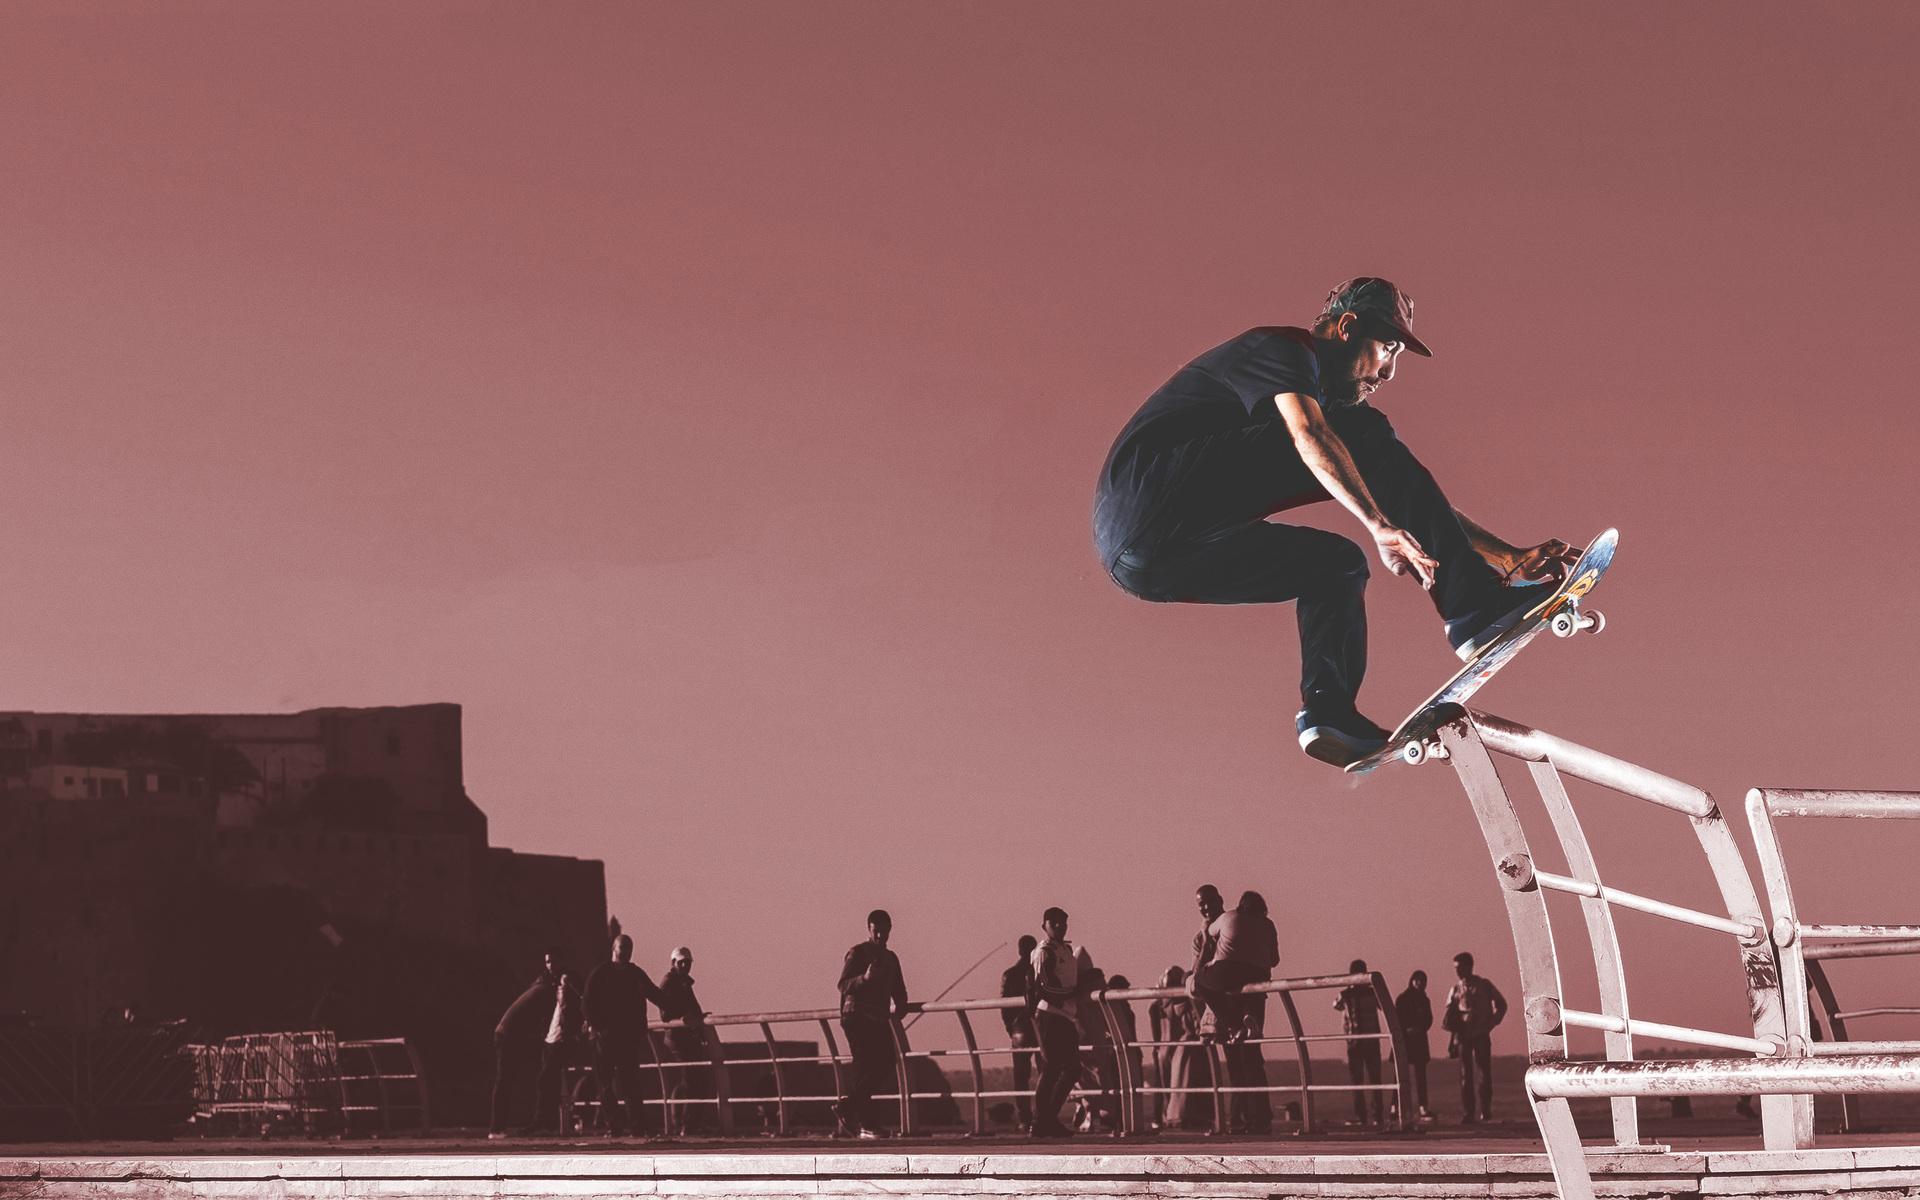 1920x1200 Skateboard Stunting Man 4k 1080P Resolution HD ...